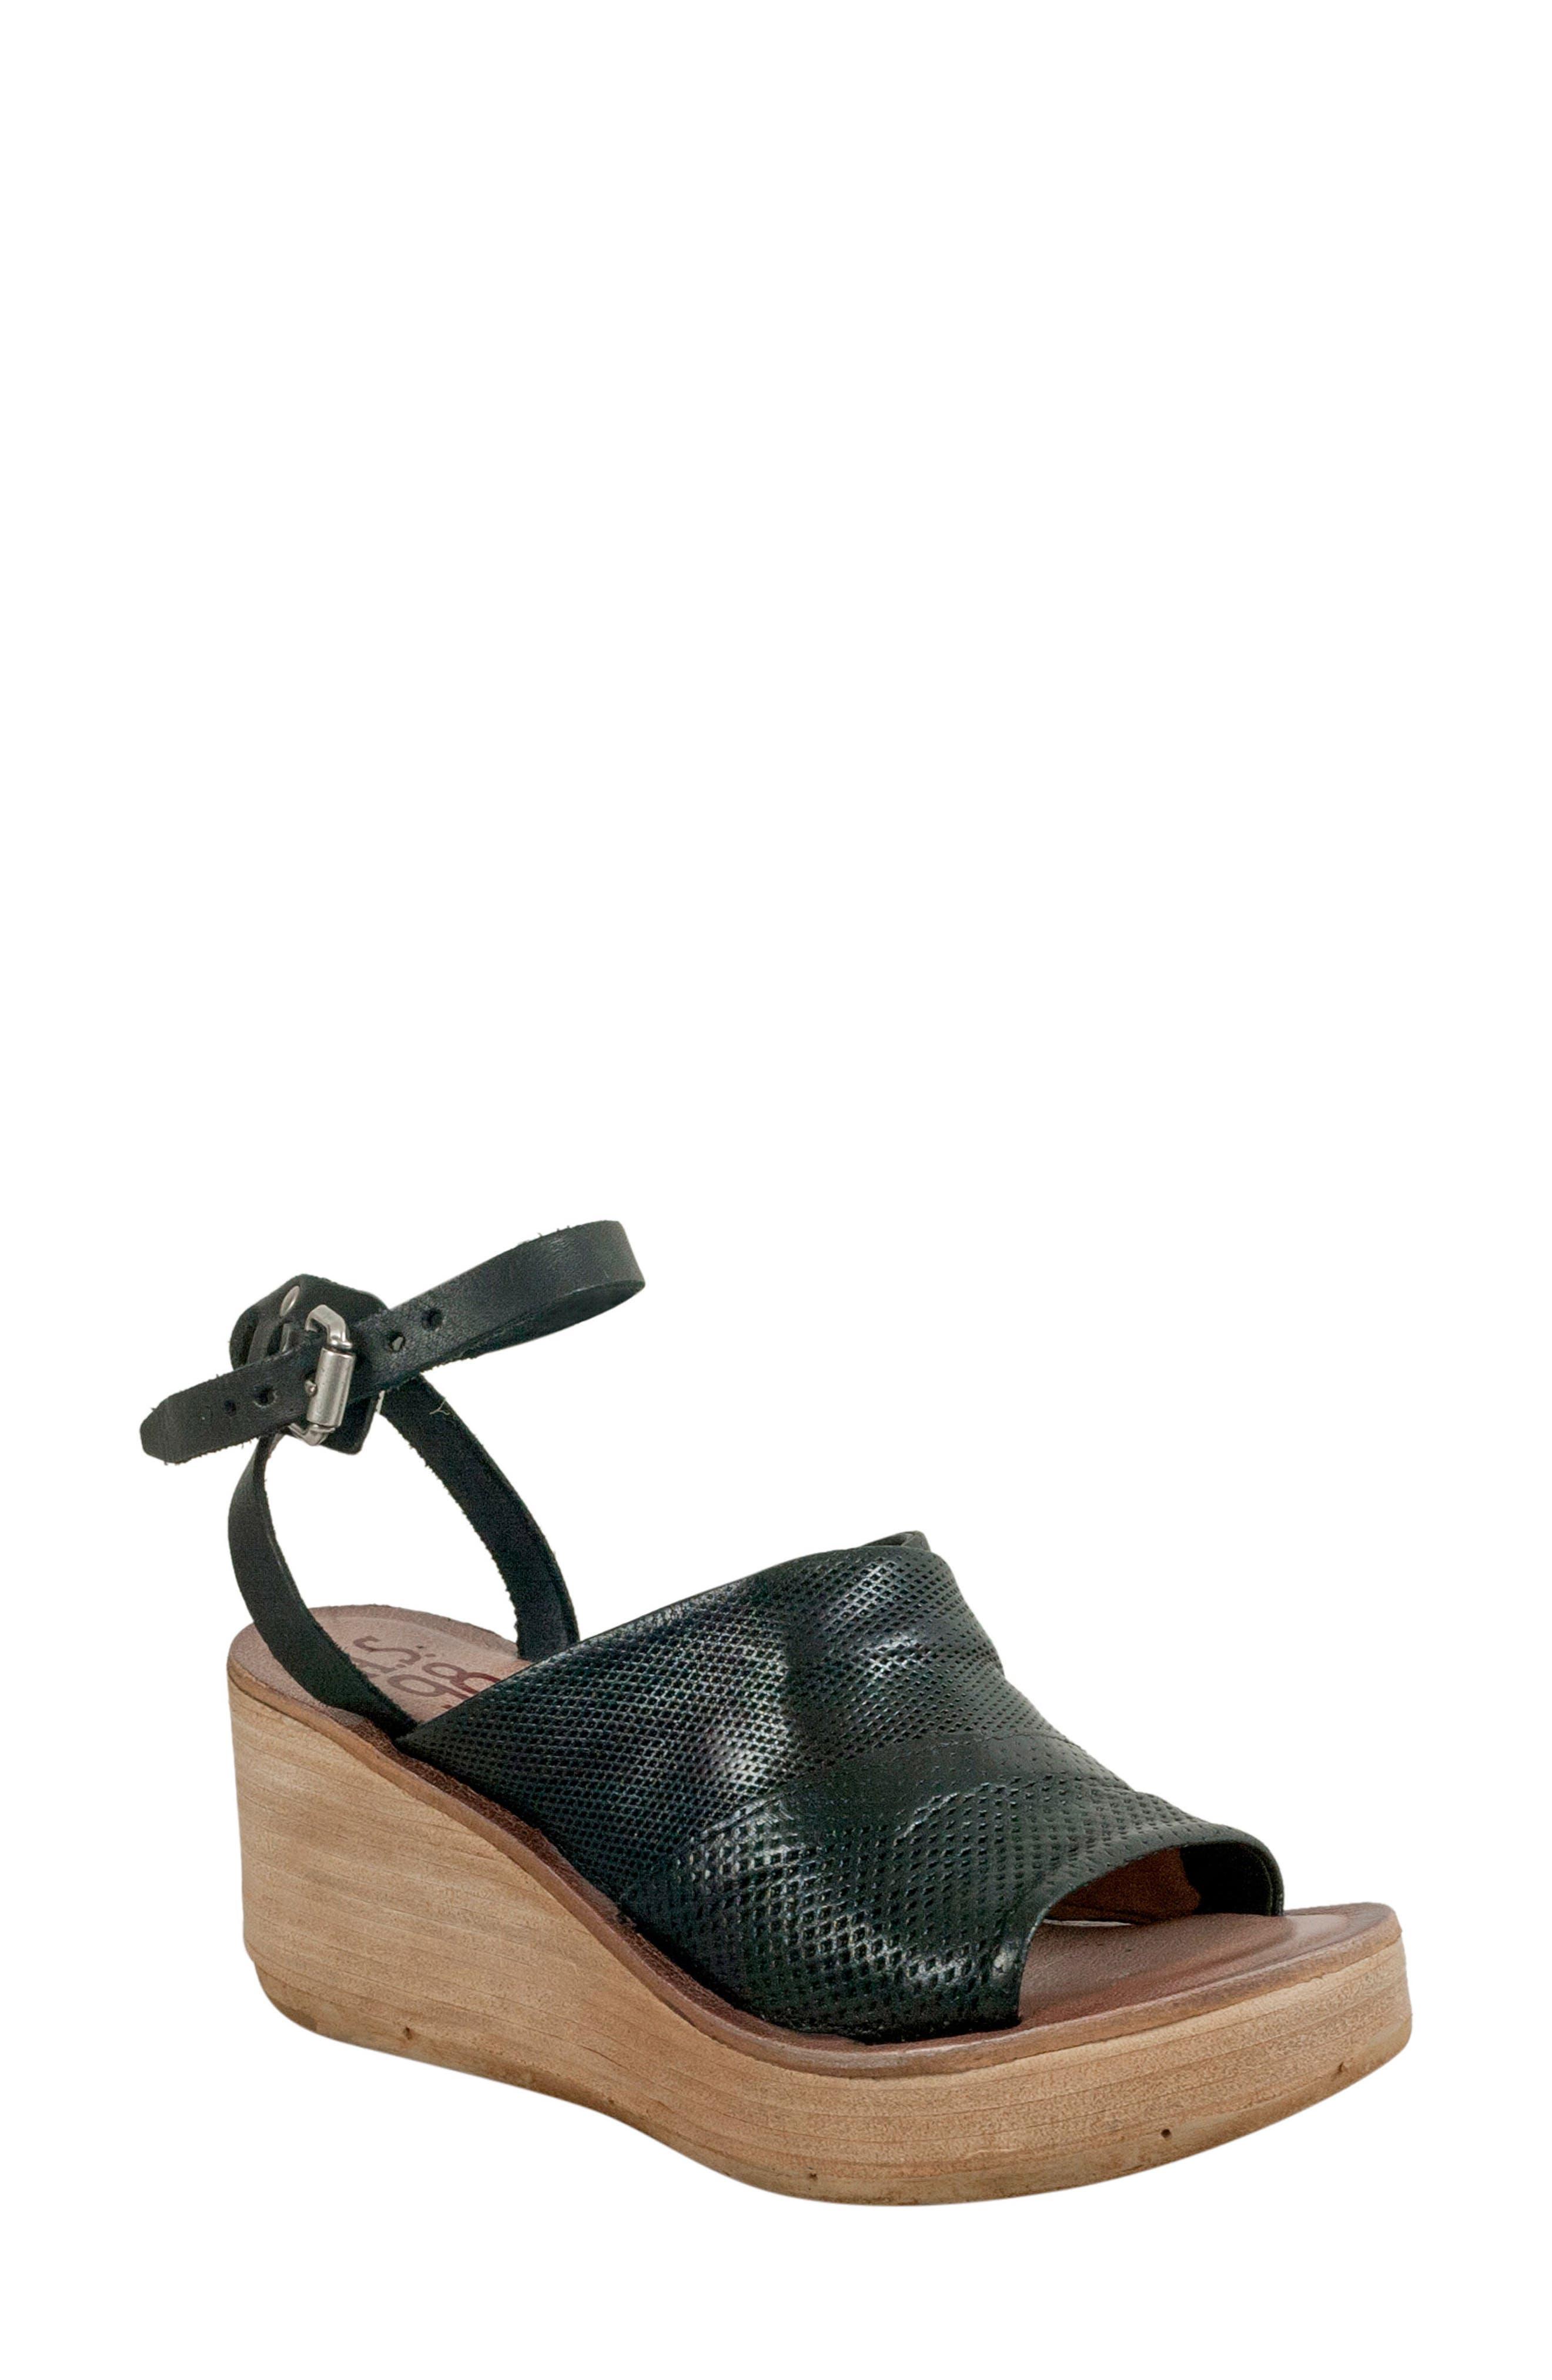 Niall Platform Wedge Sandal,                         Main,                         color,